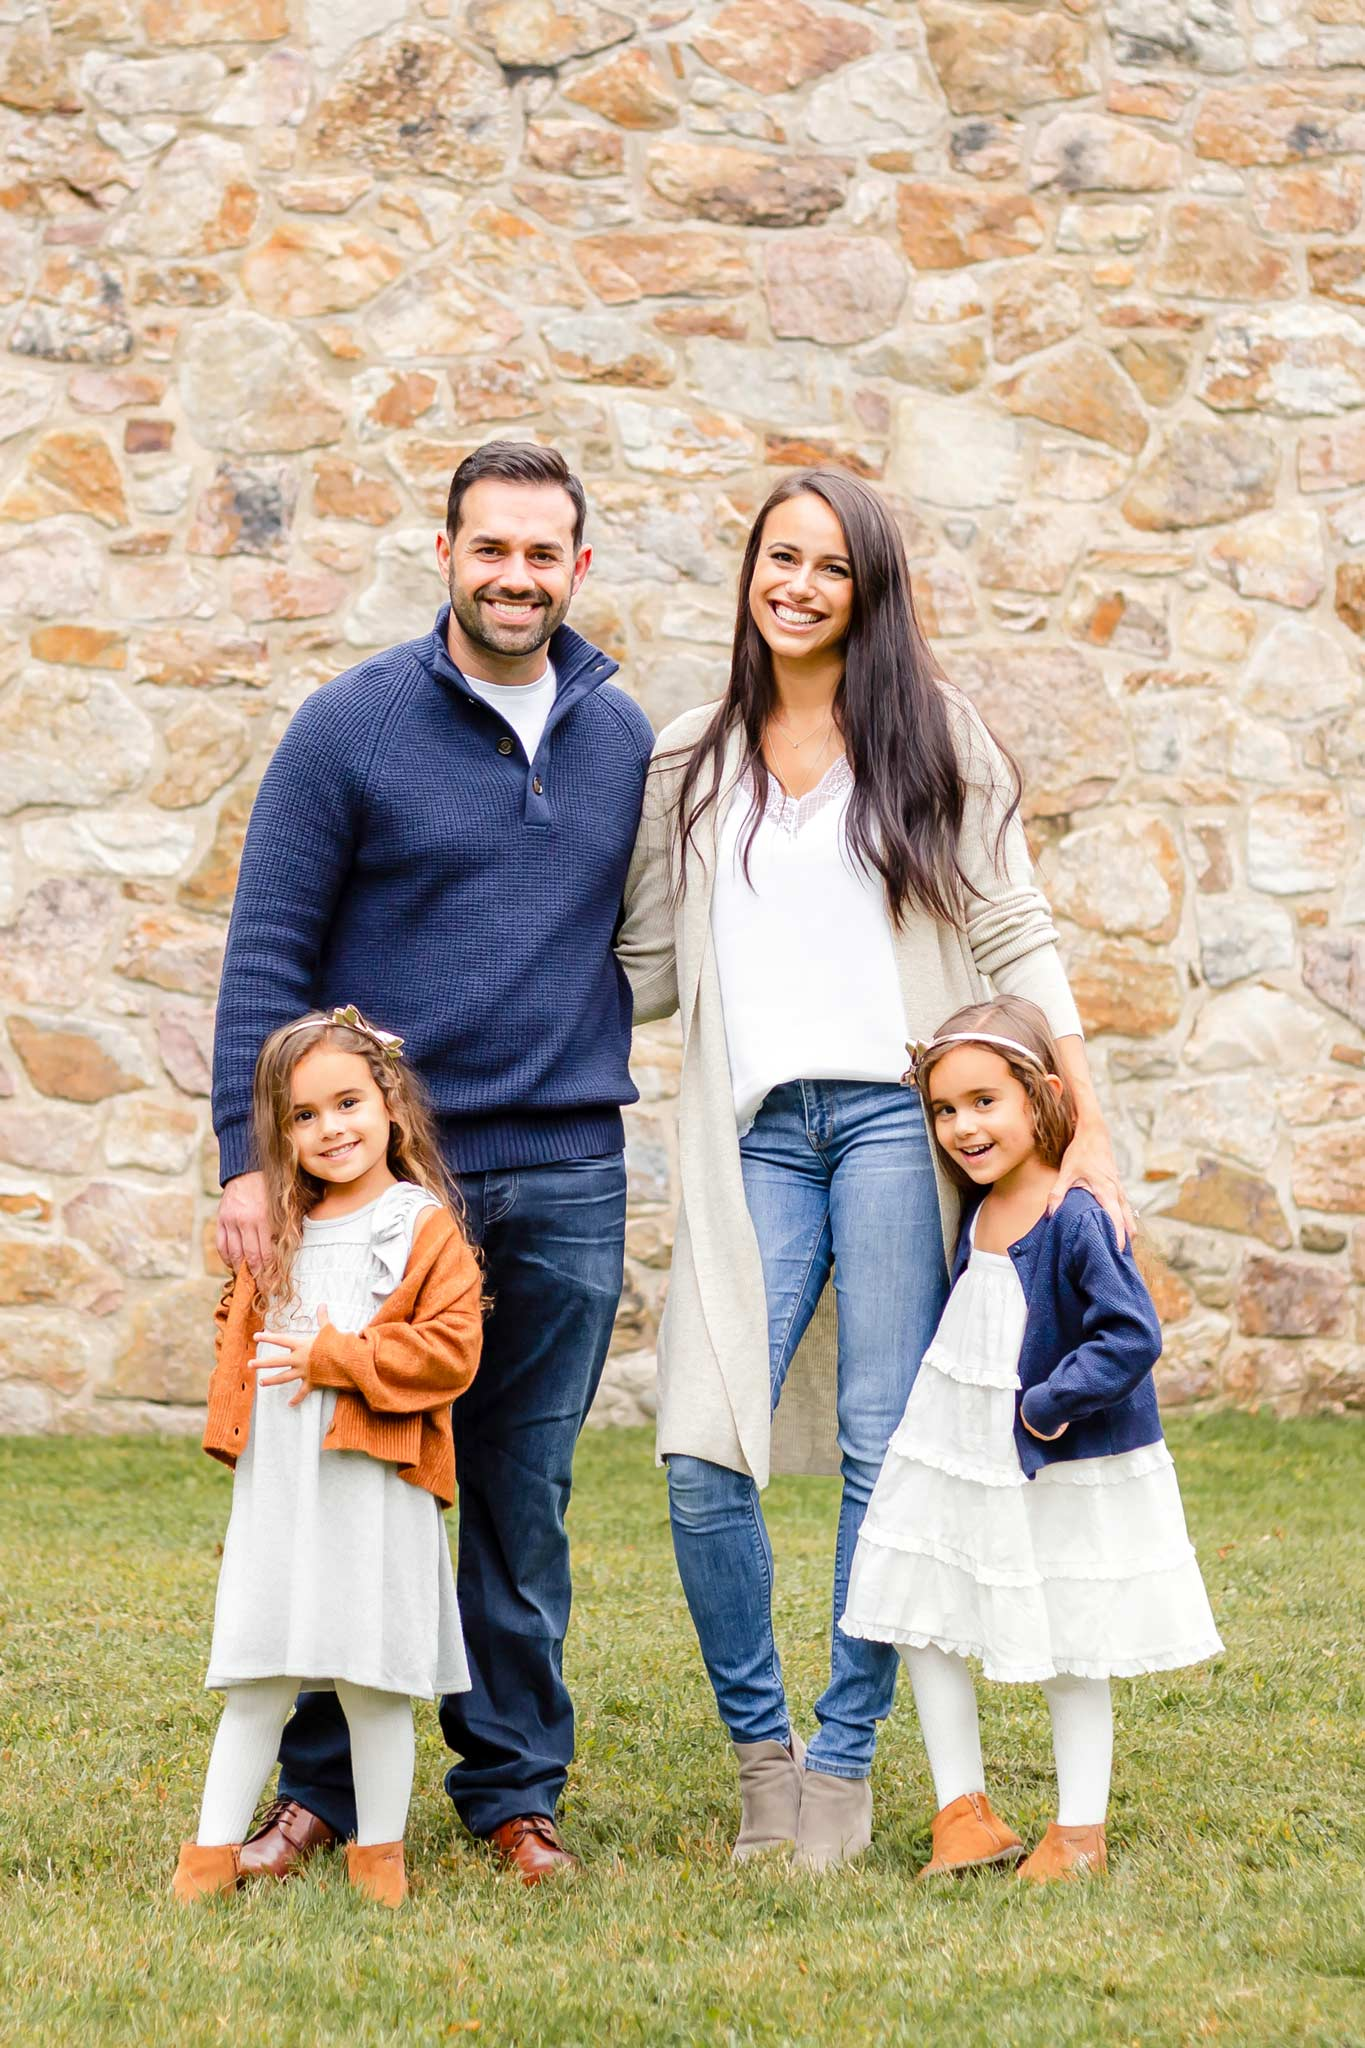 Bucks County Family Portrait